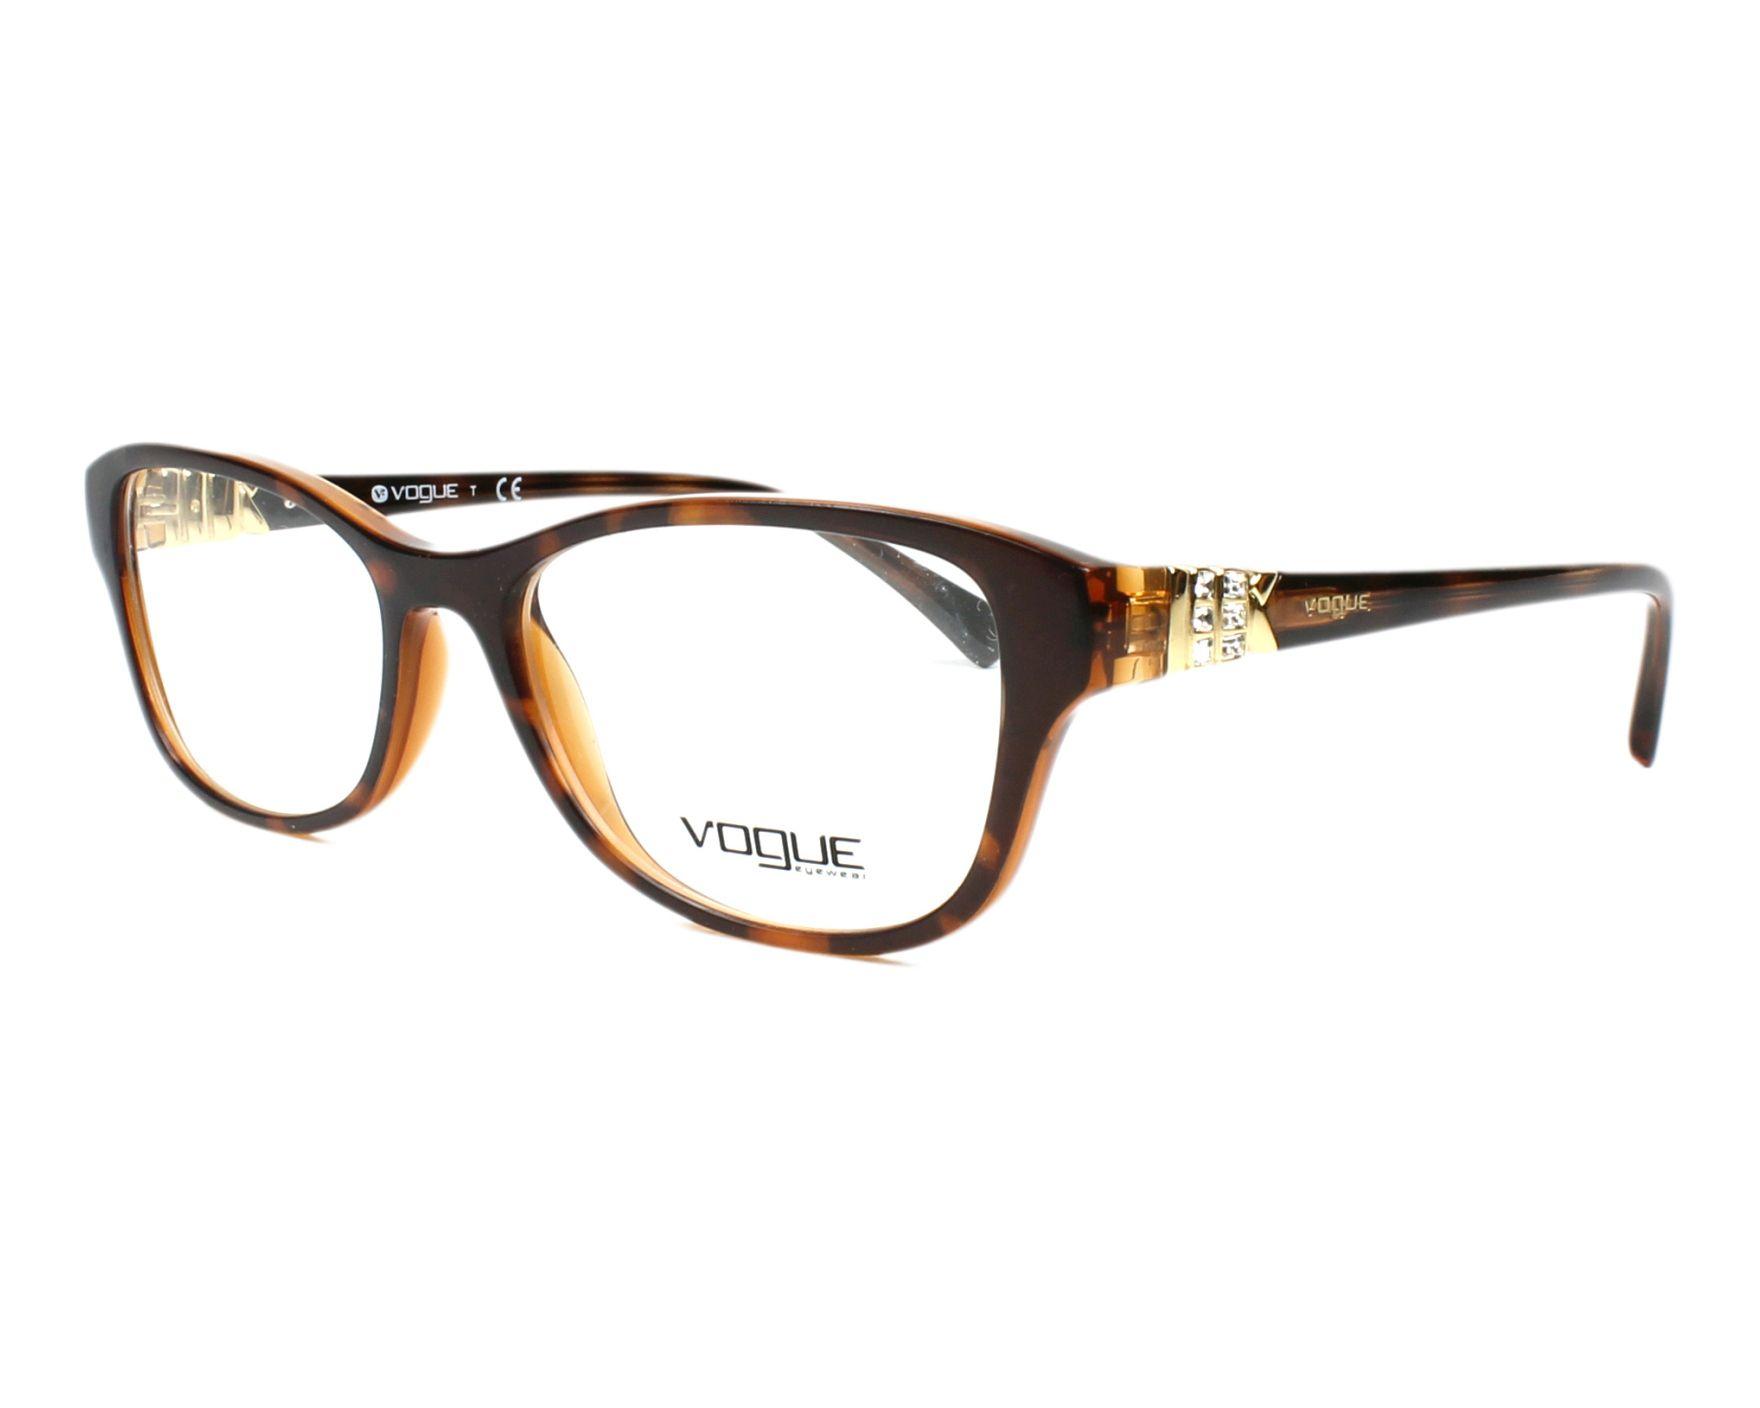 59c75ea7f7 Gafas Graduadas Vogue VO-5170-B 2386 52-16 Havana vista de perfil